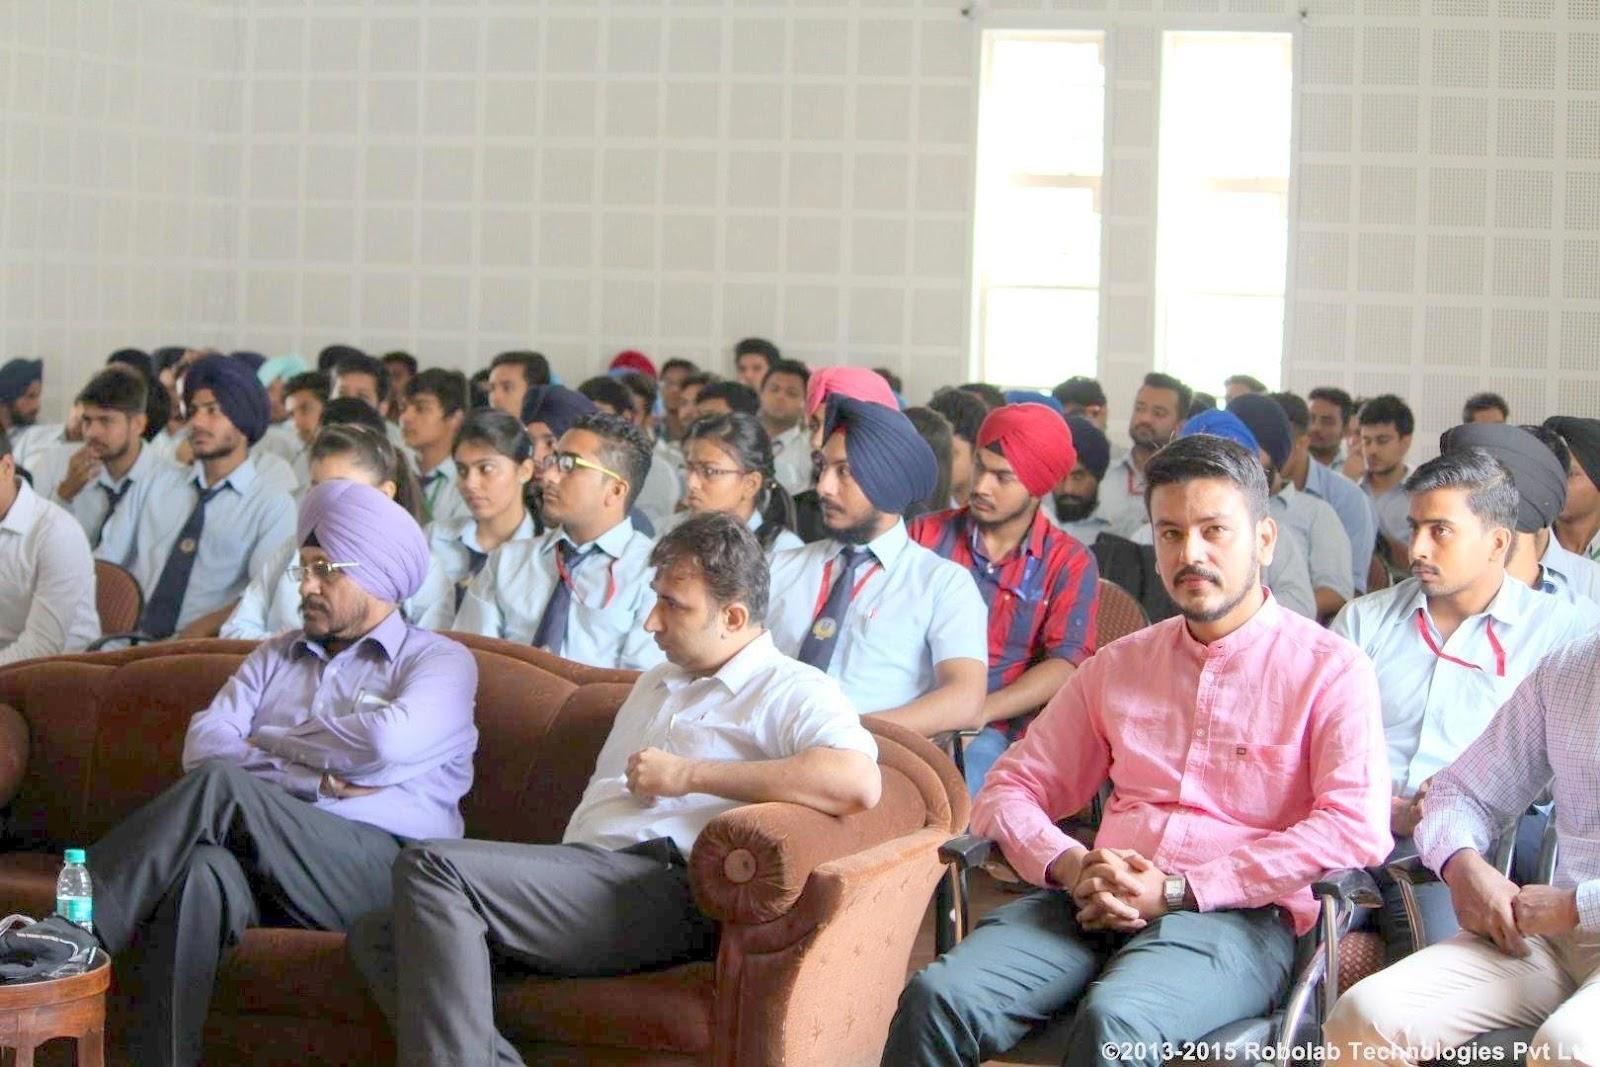 Amritsar College Of Engineering and Technology, Amritsar Robolab 15 (5).jpg